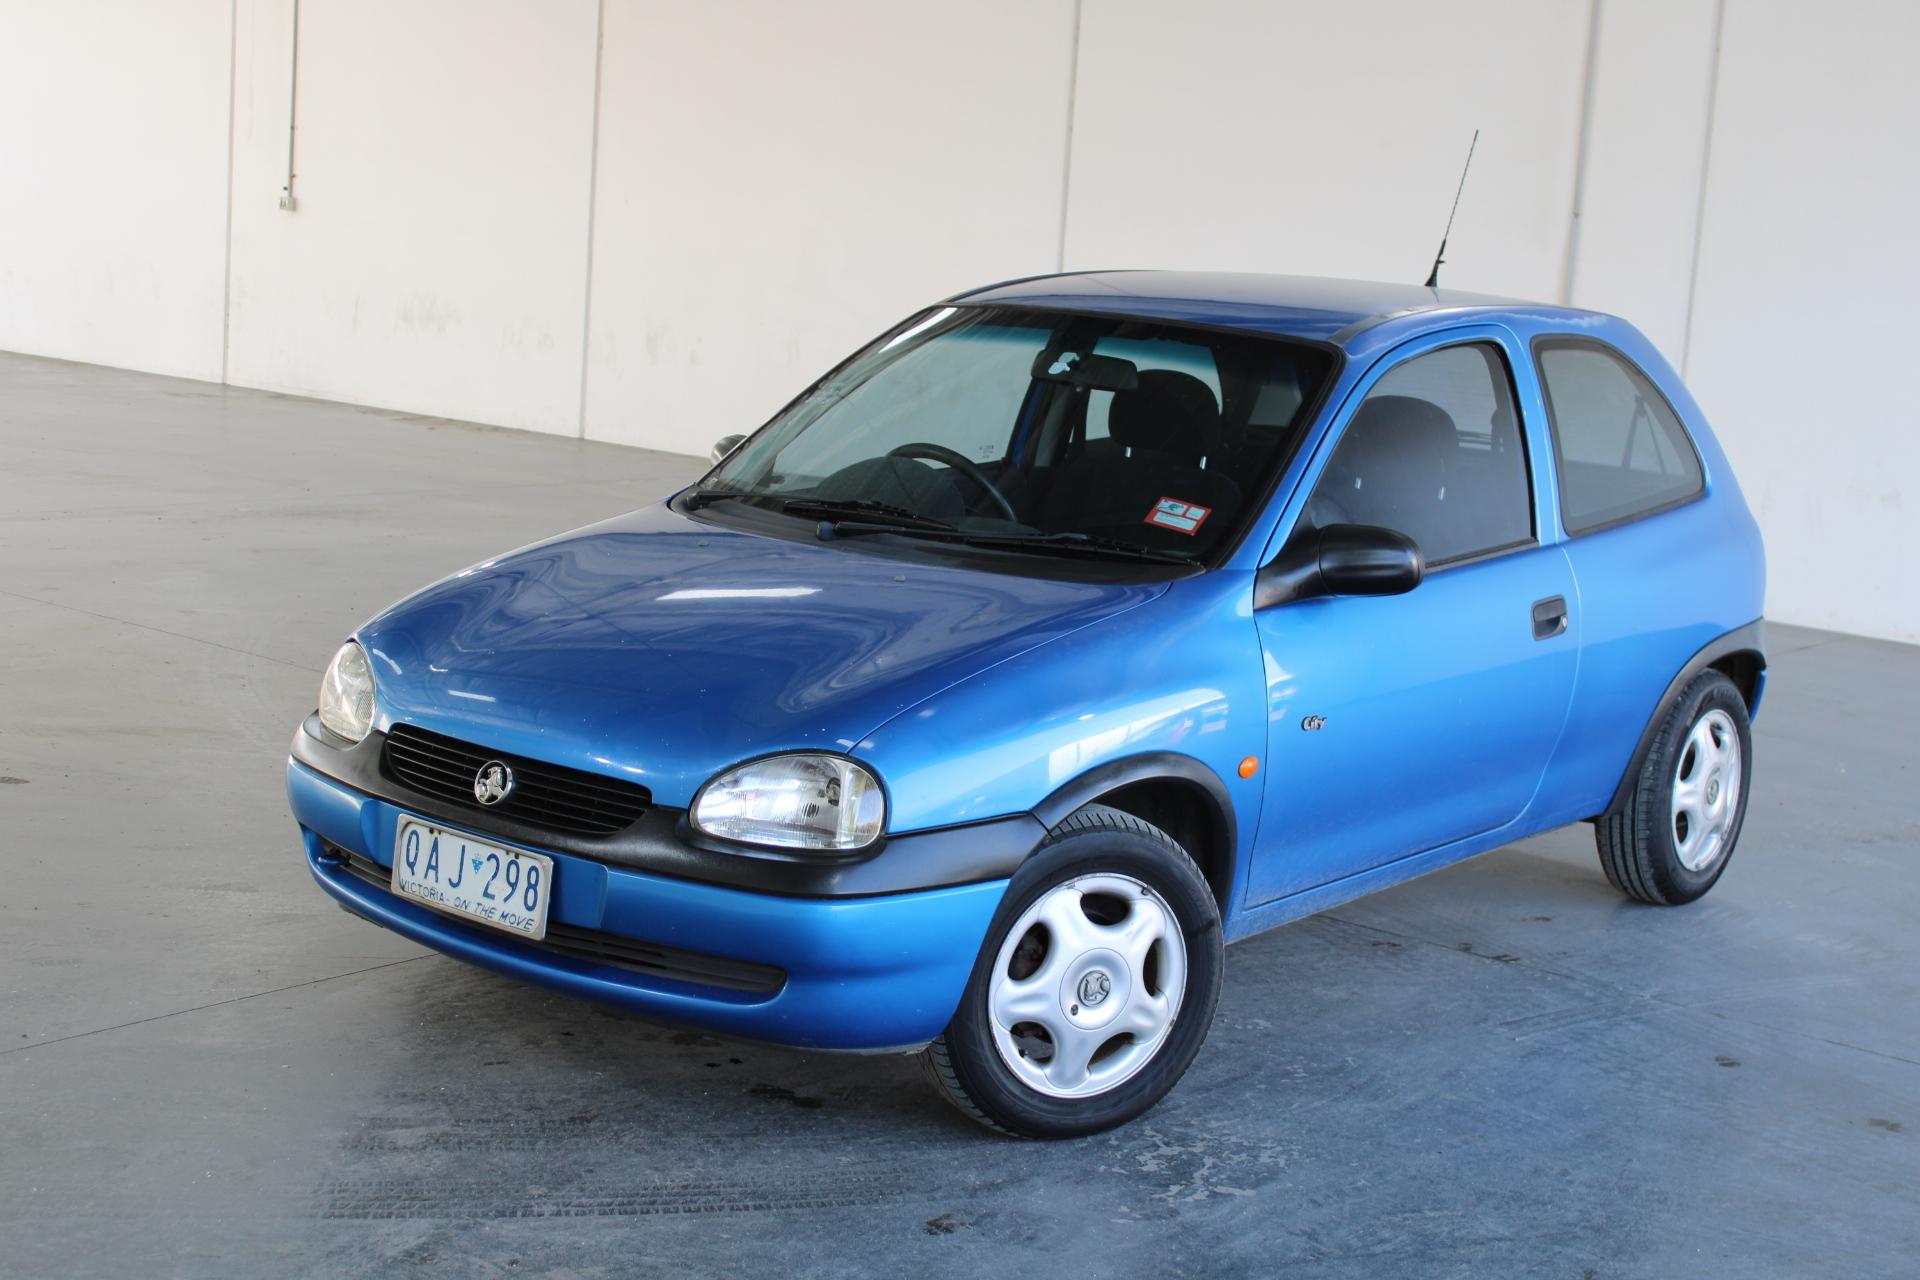 2000 Holden Barina City SB Manual Hatchback